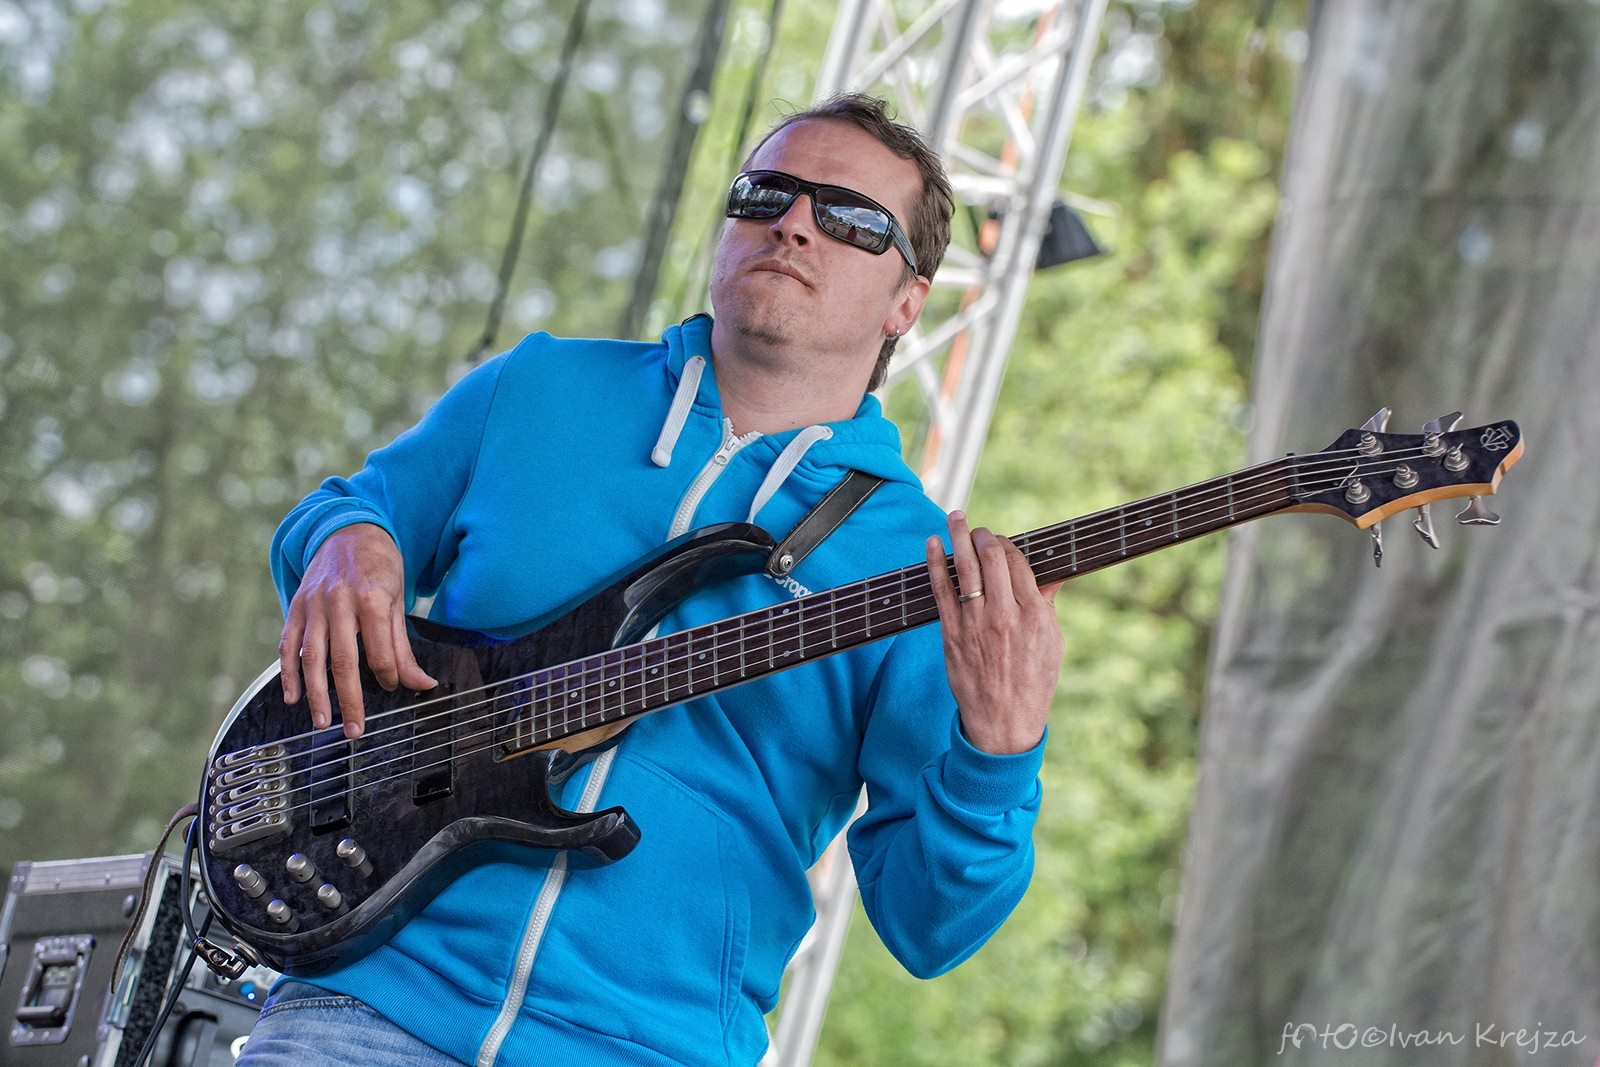 2015-06-20 - Hrebecsky Slunovrat 2015 - 05 (Gang Ala Basta) - Jan Somy Somolík